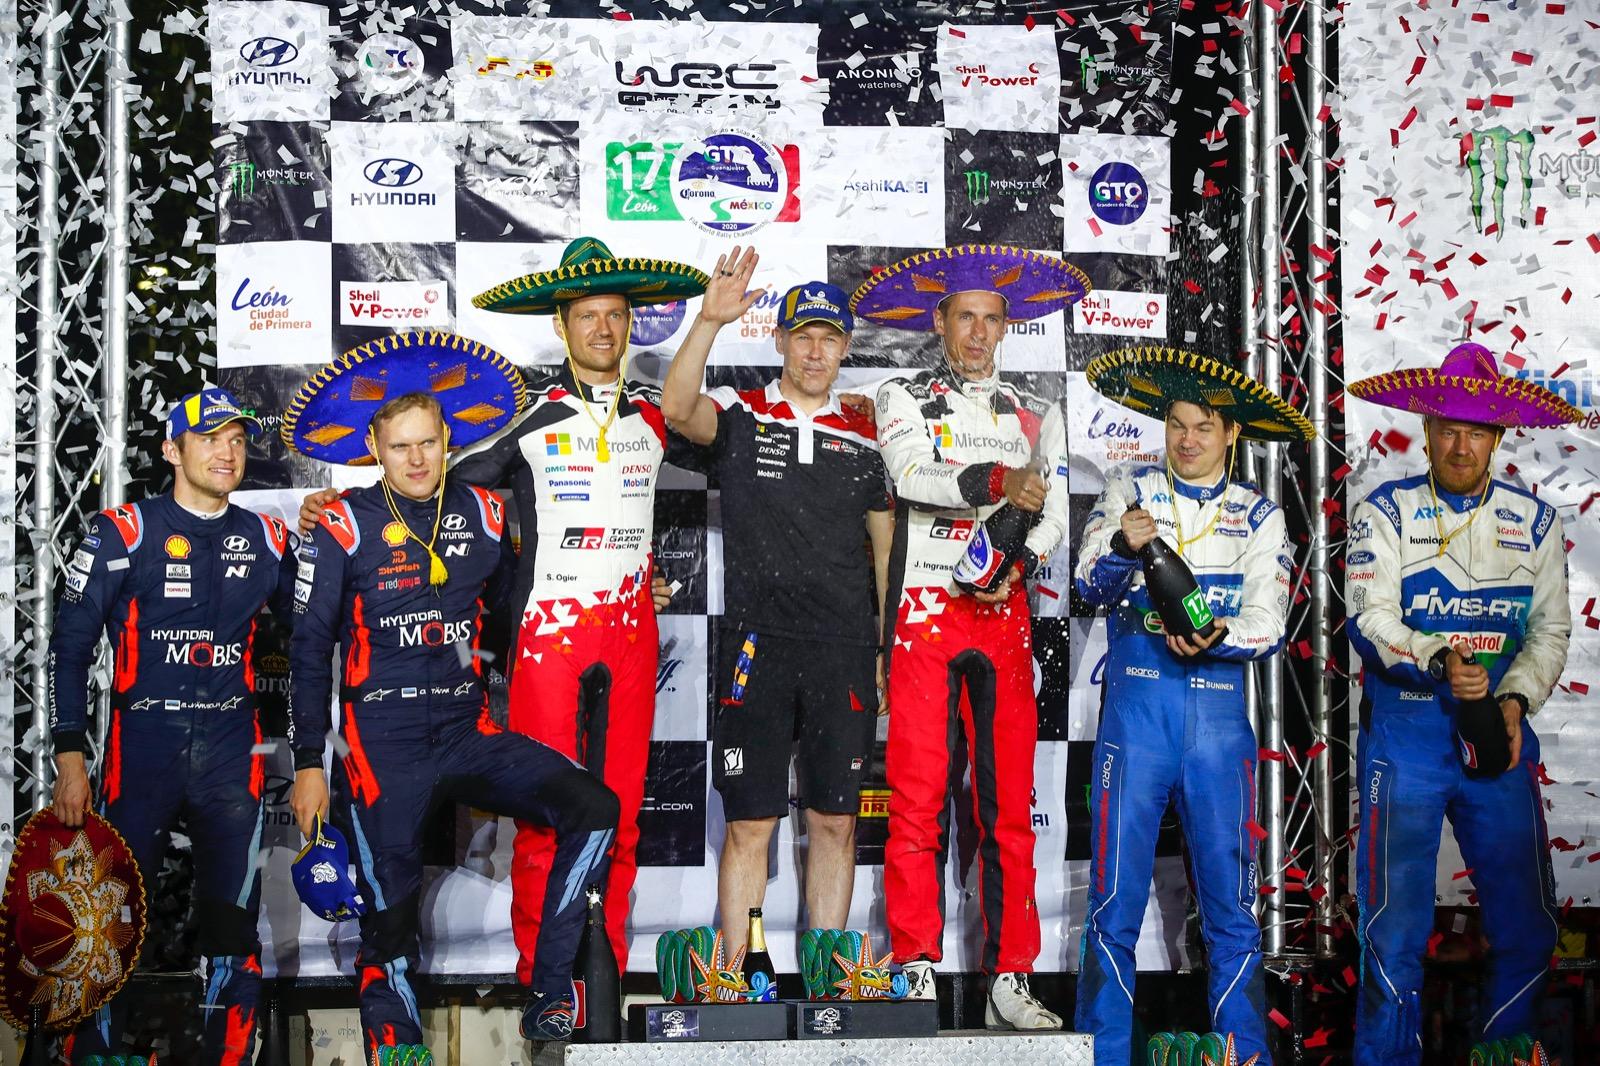 WRC: 17º Rallye Guanajuato Corona - México [12-15 Marzo] - Página 7 ETH4-ImX0AA8npN?format=jpg&name=large